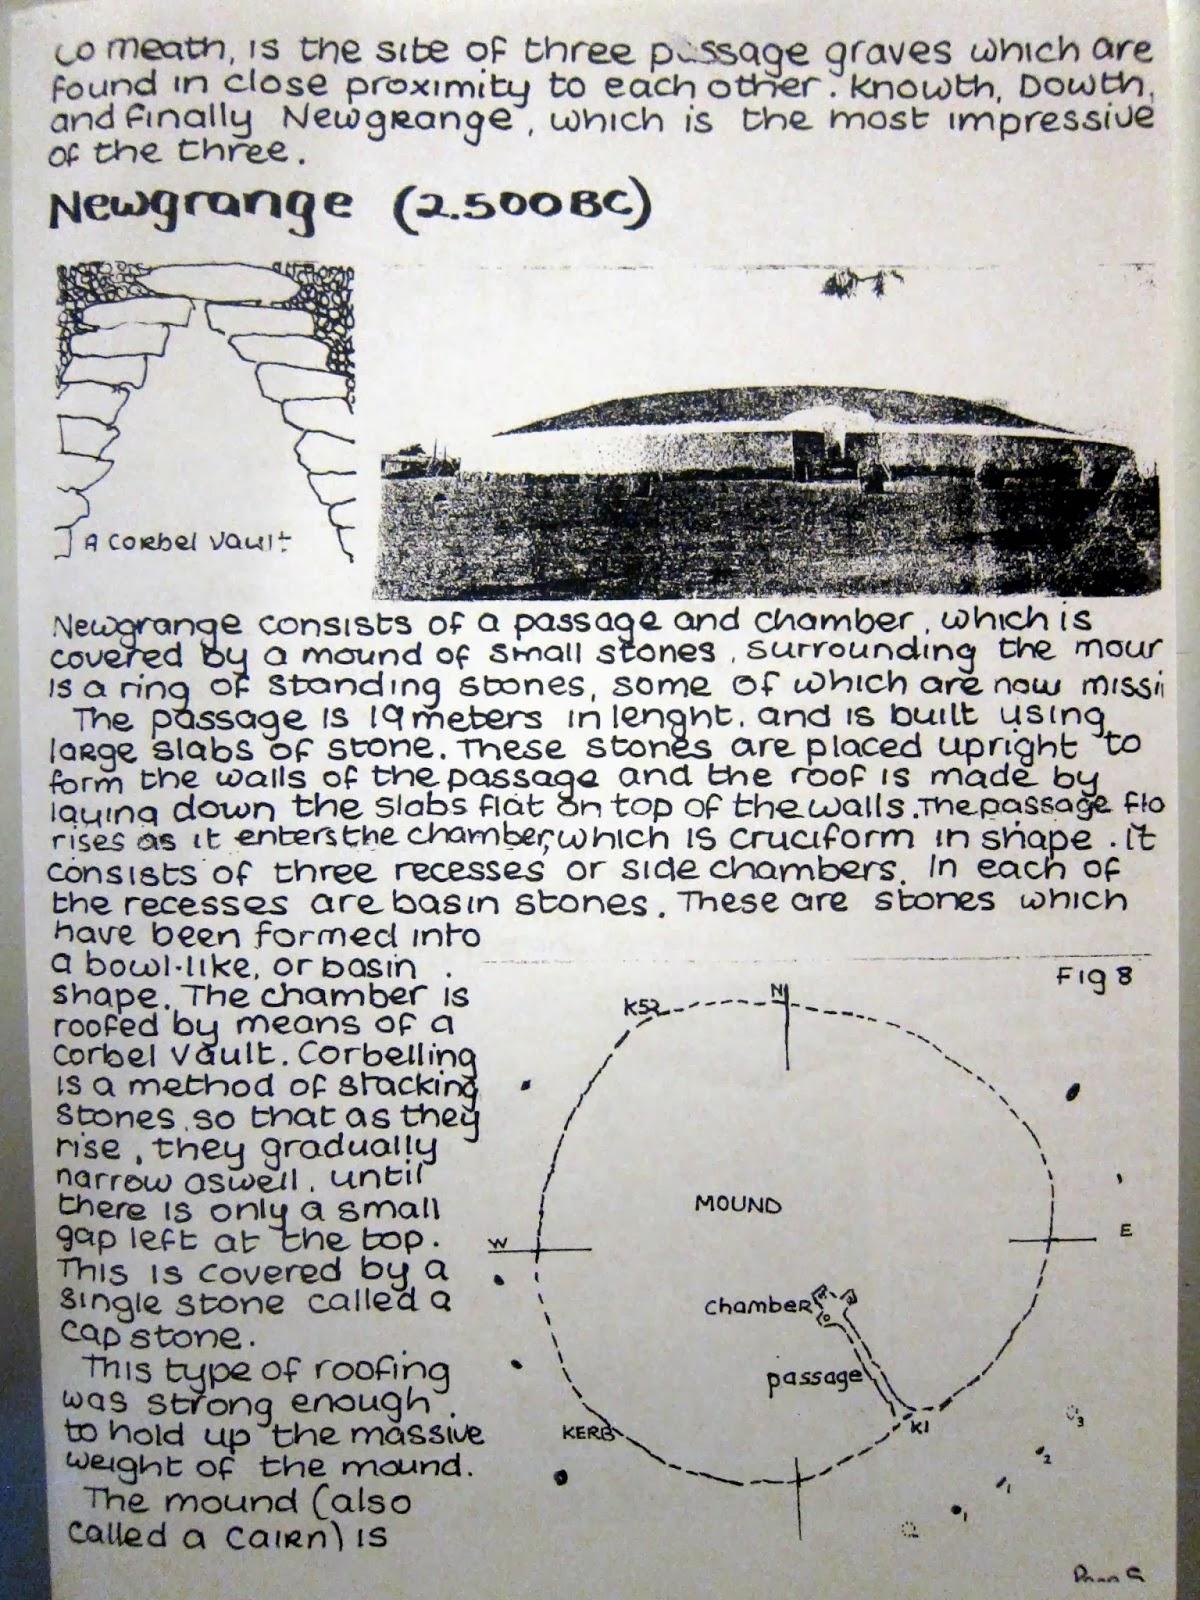 Newgrange essay art history